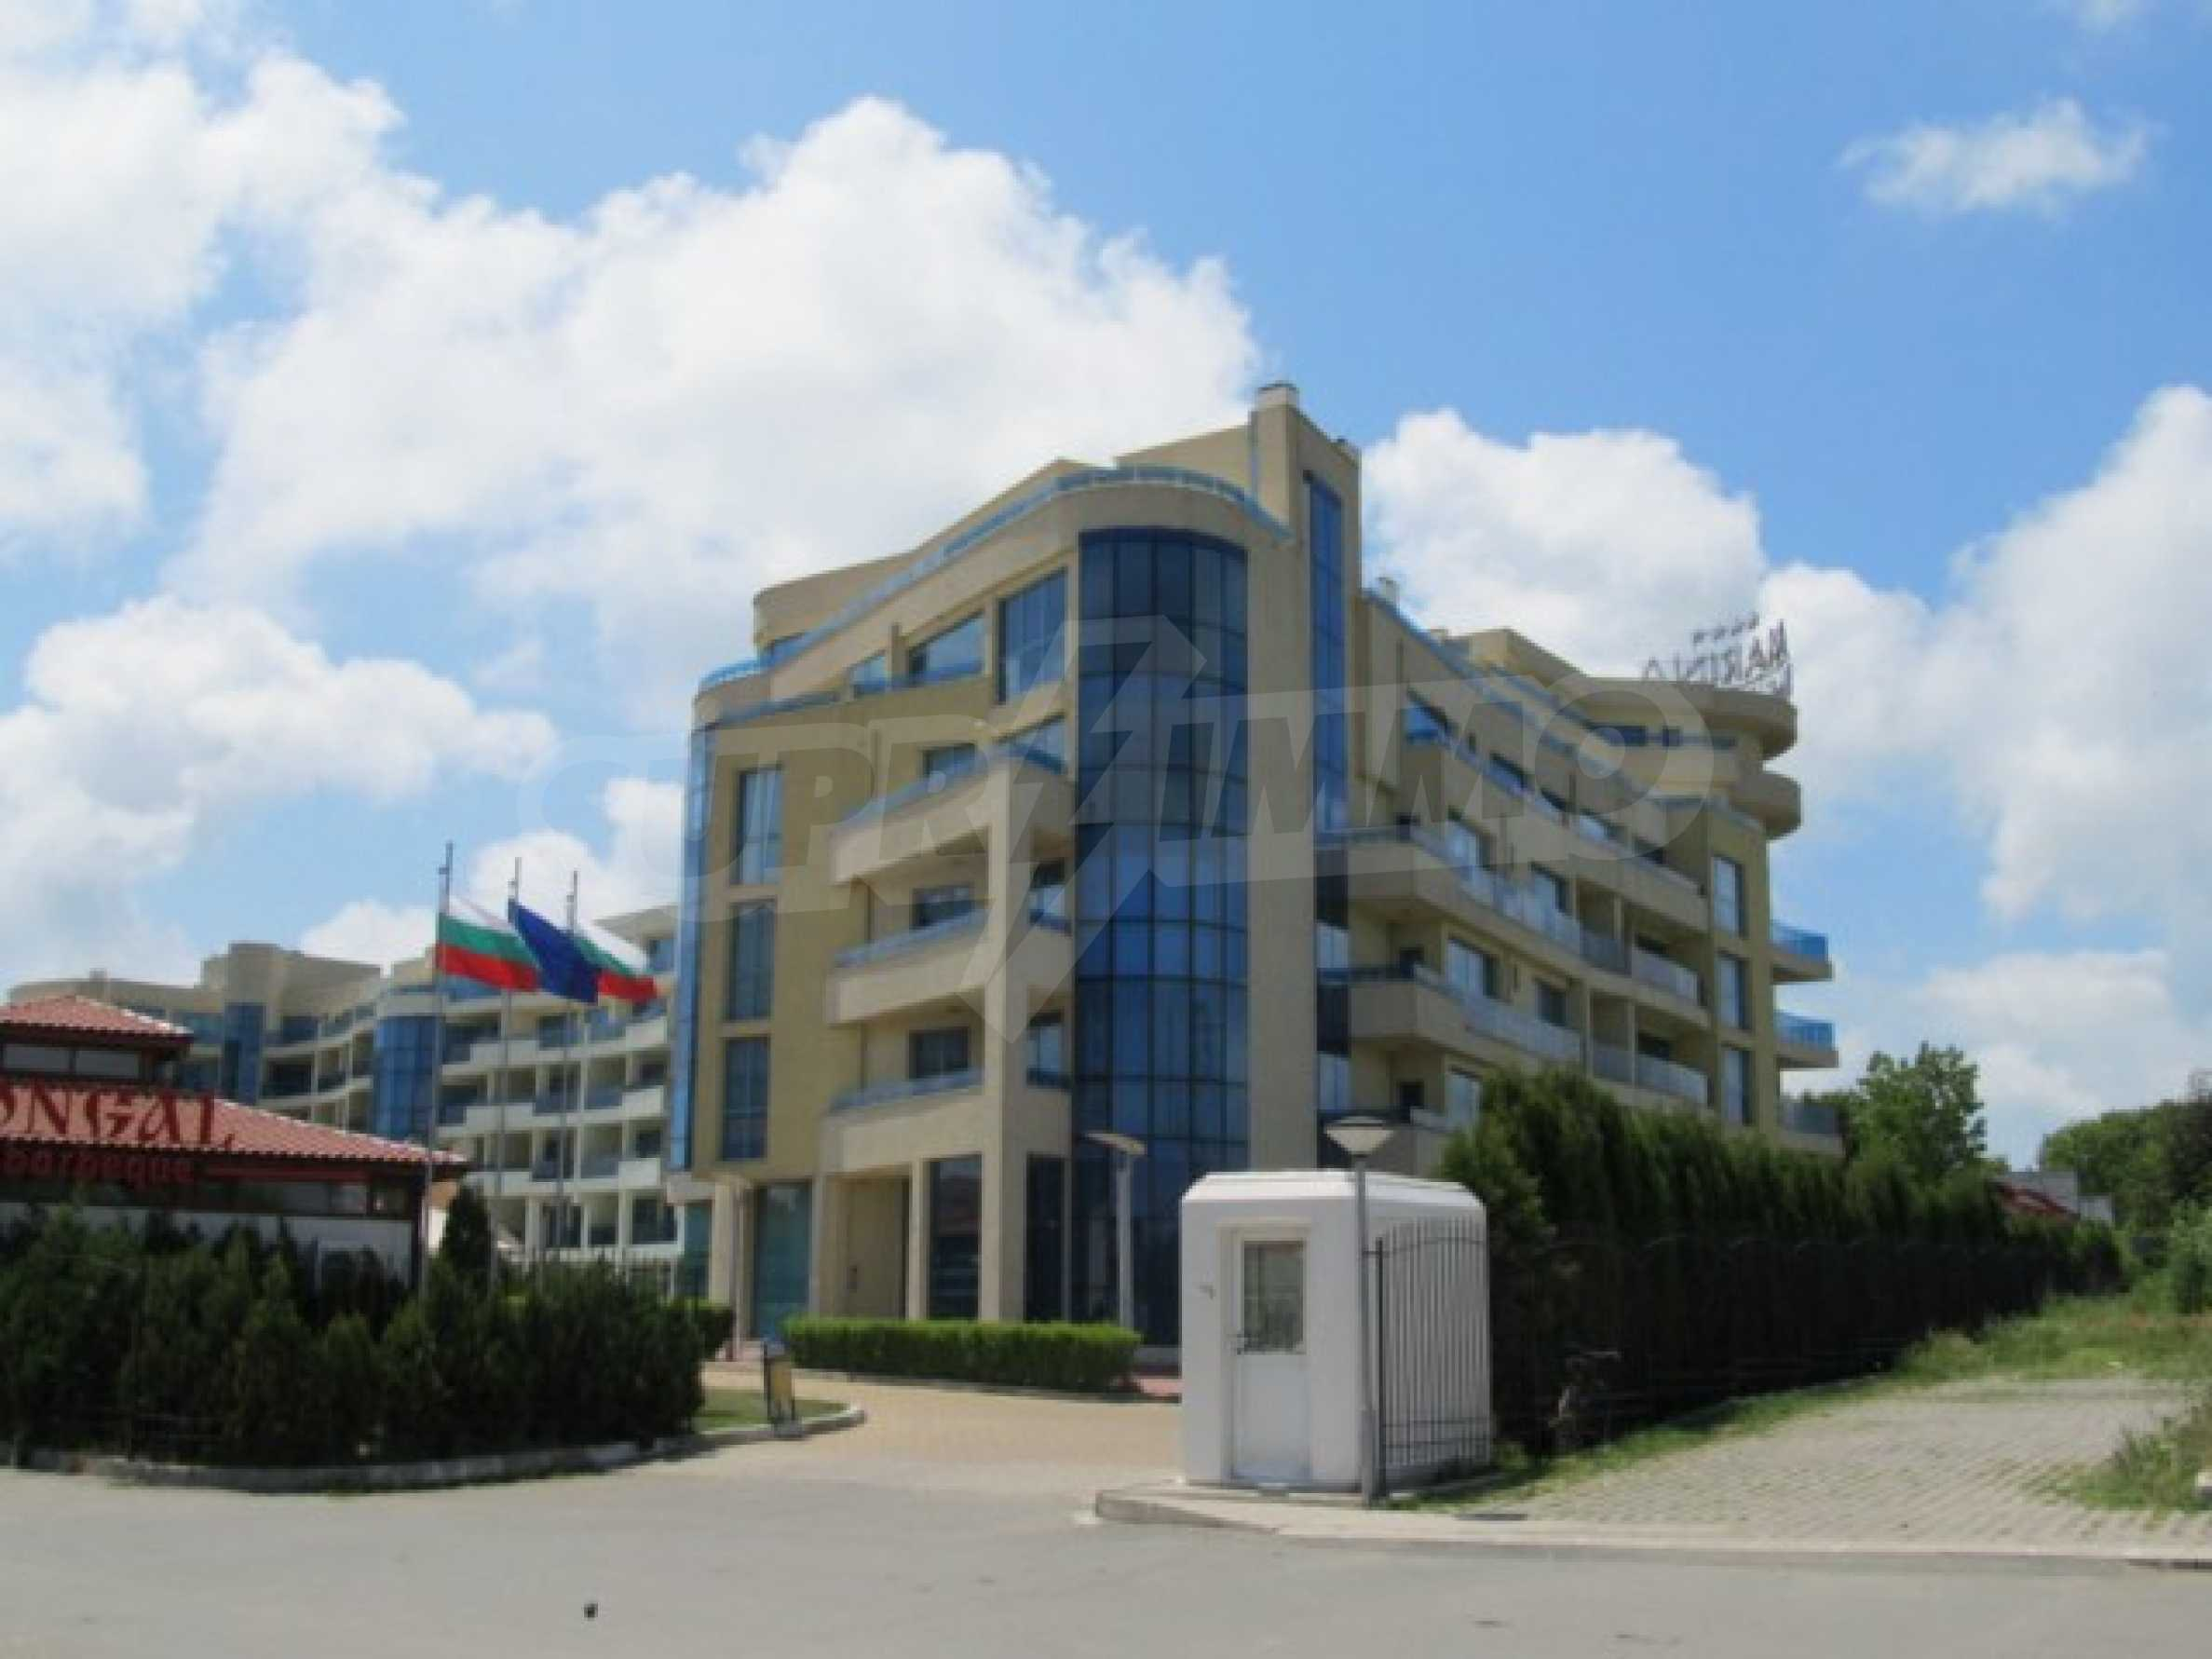 Тристаен апартамент за продажба в Поморие 2